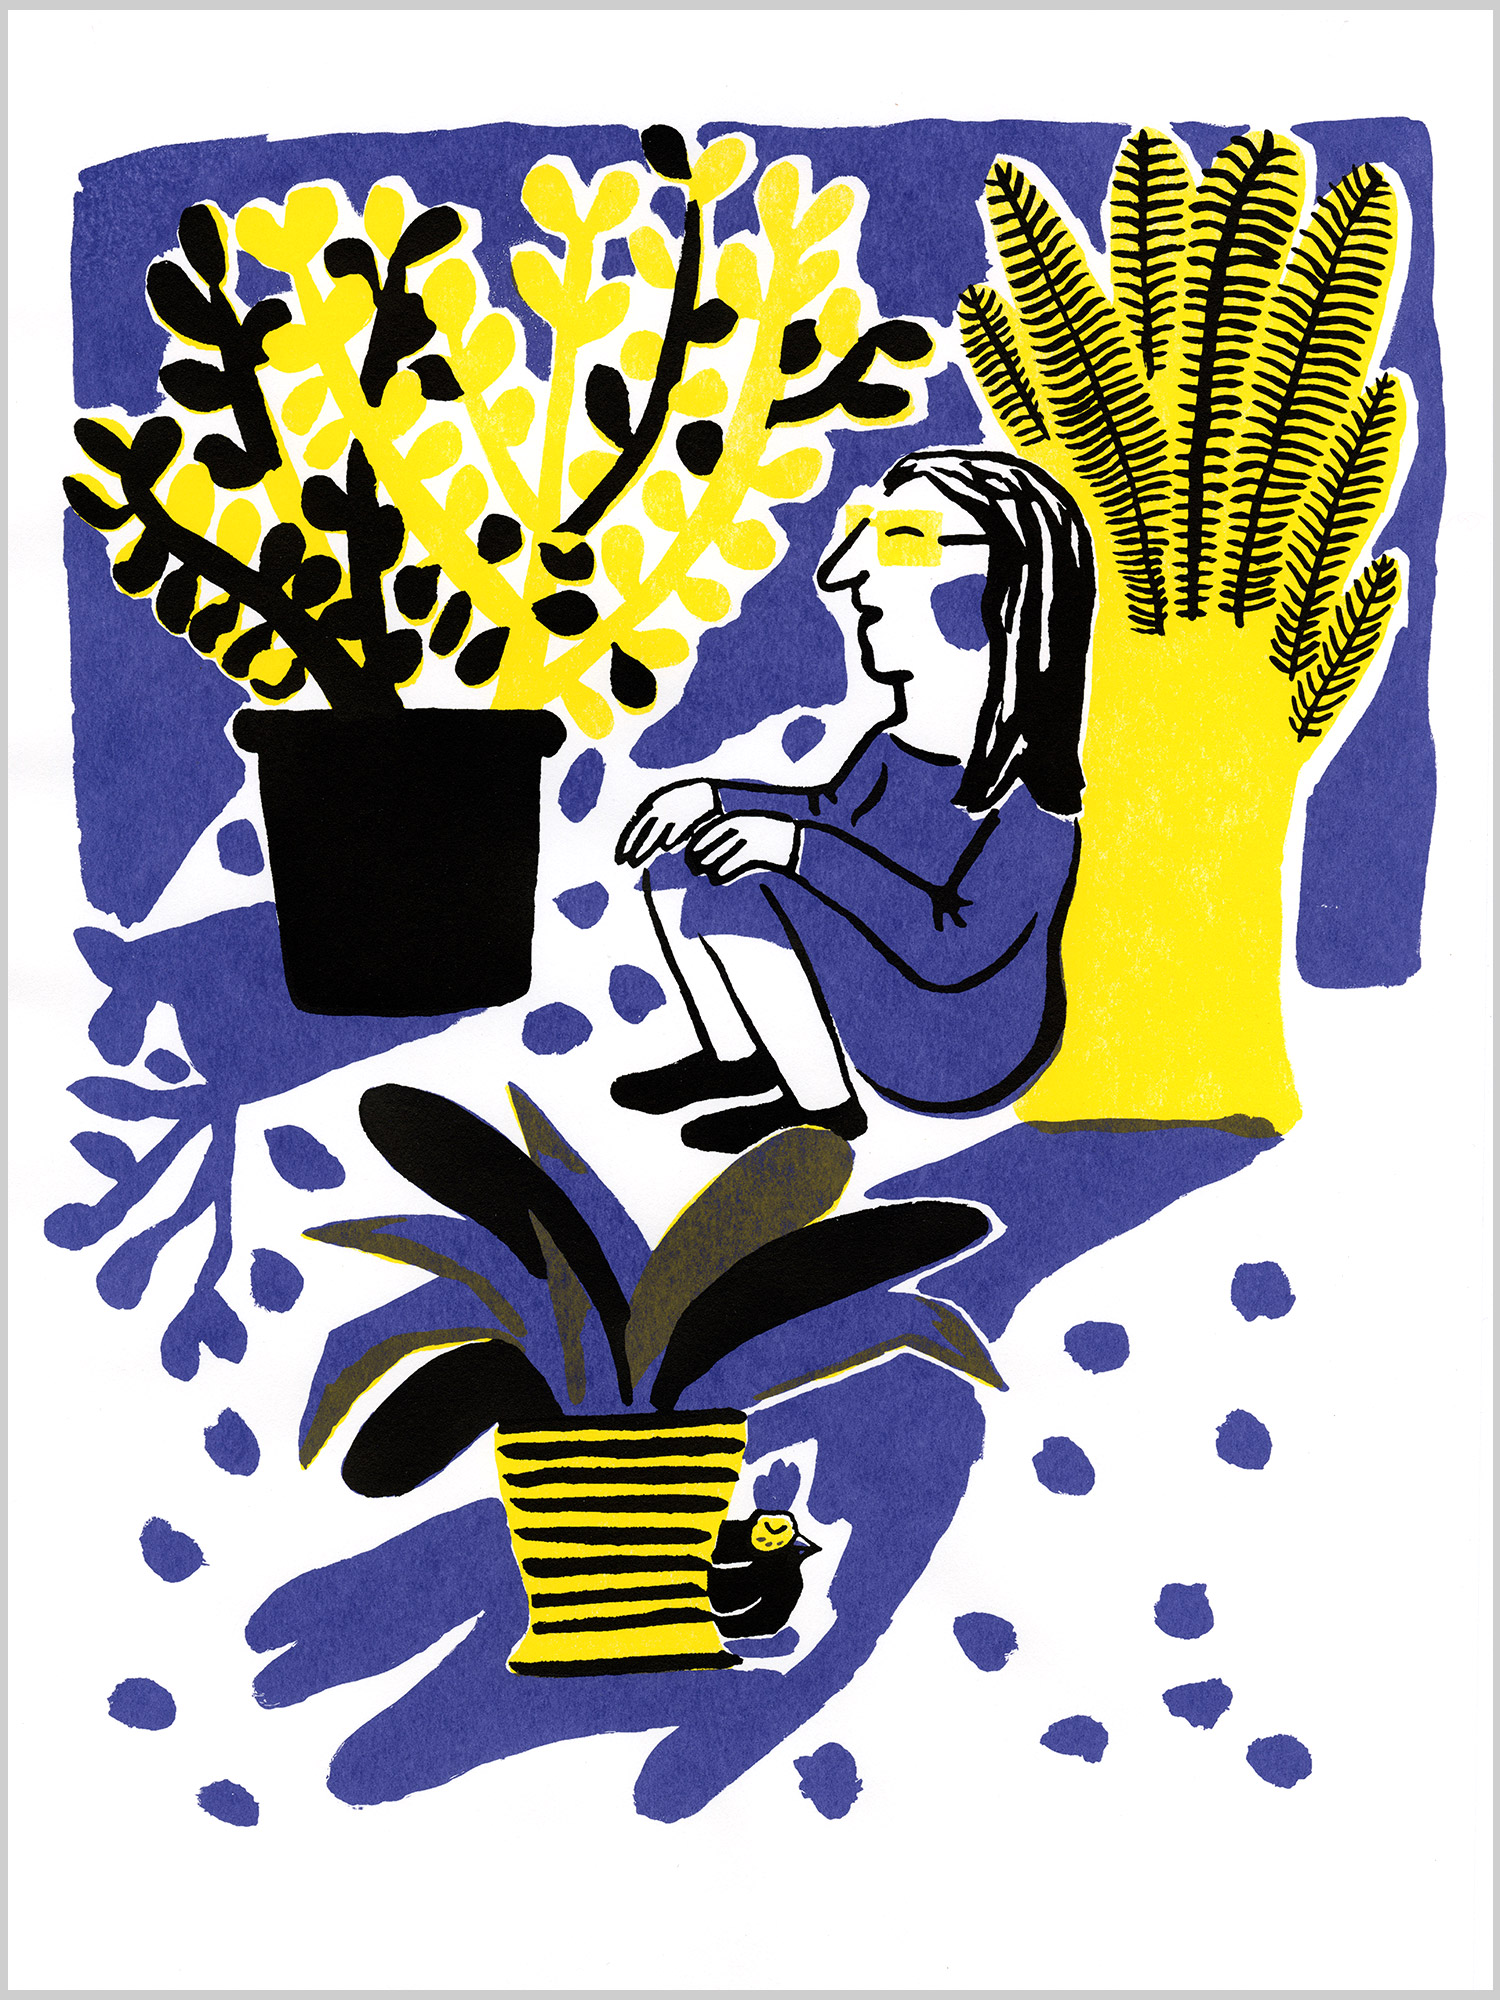 Mon amie Poulette 02 © Magali Bardos sérigraphie affiche silkscreen printing poster jaune violet noir yellow black